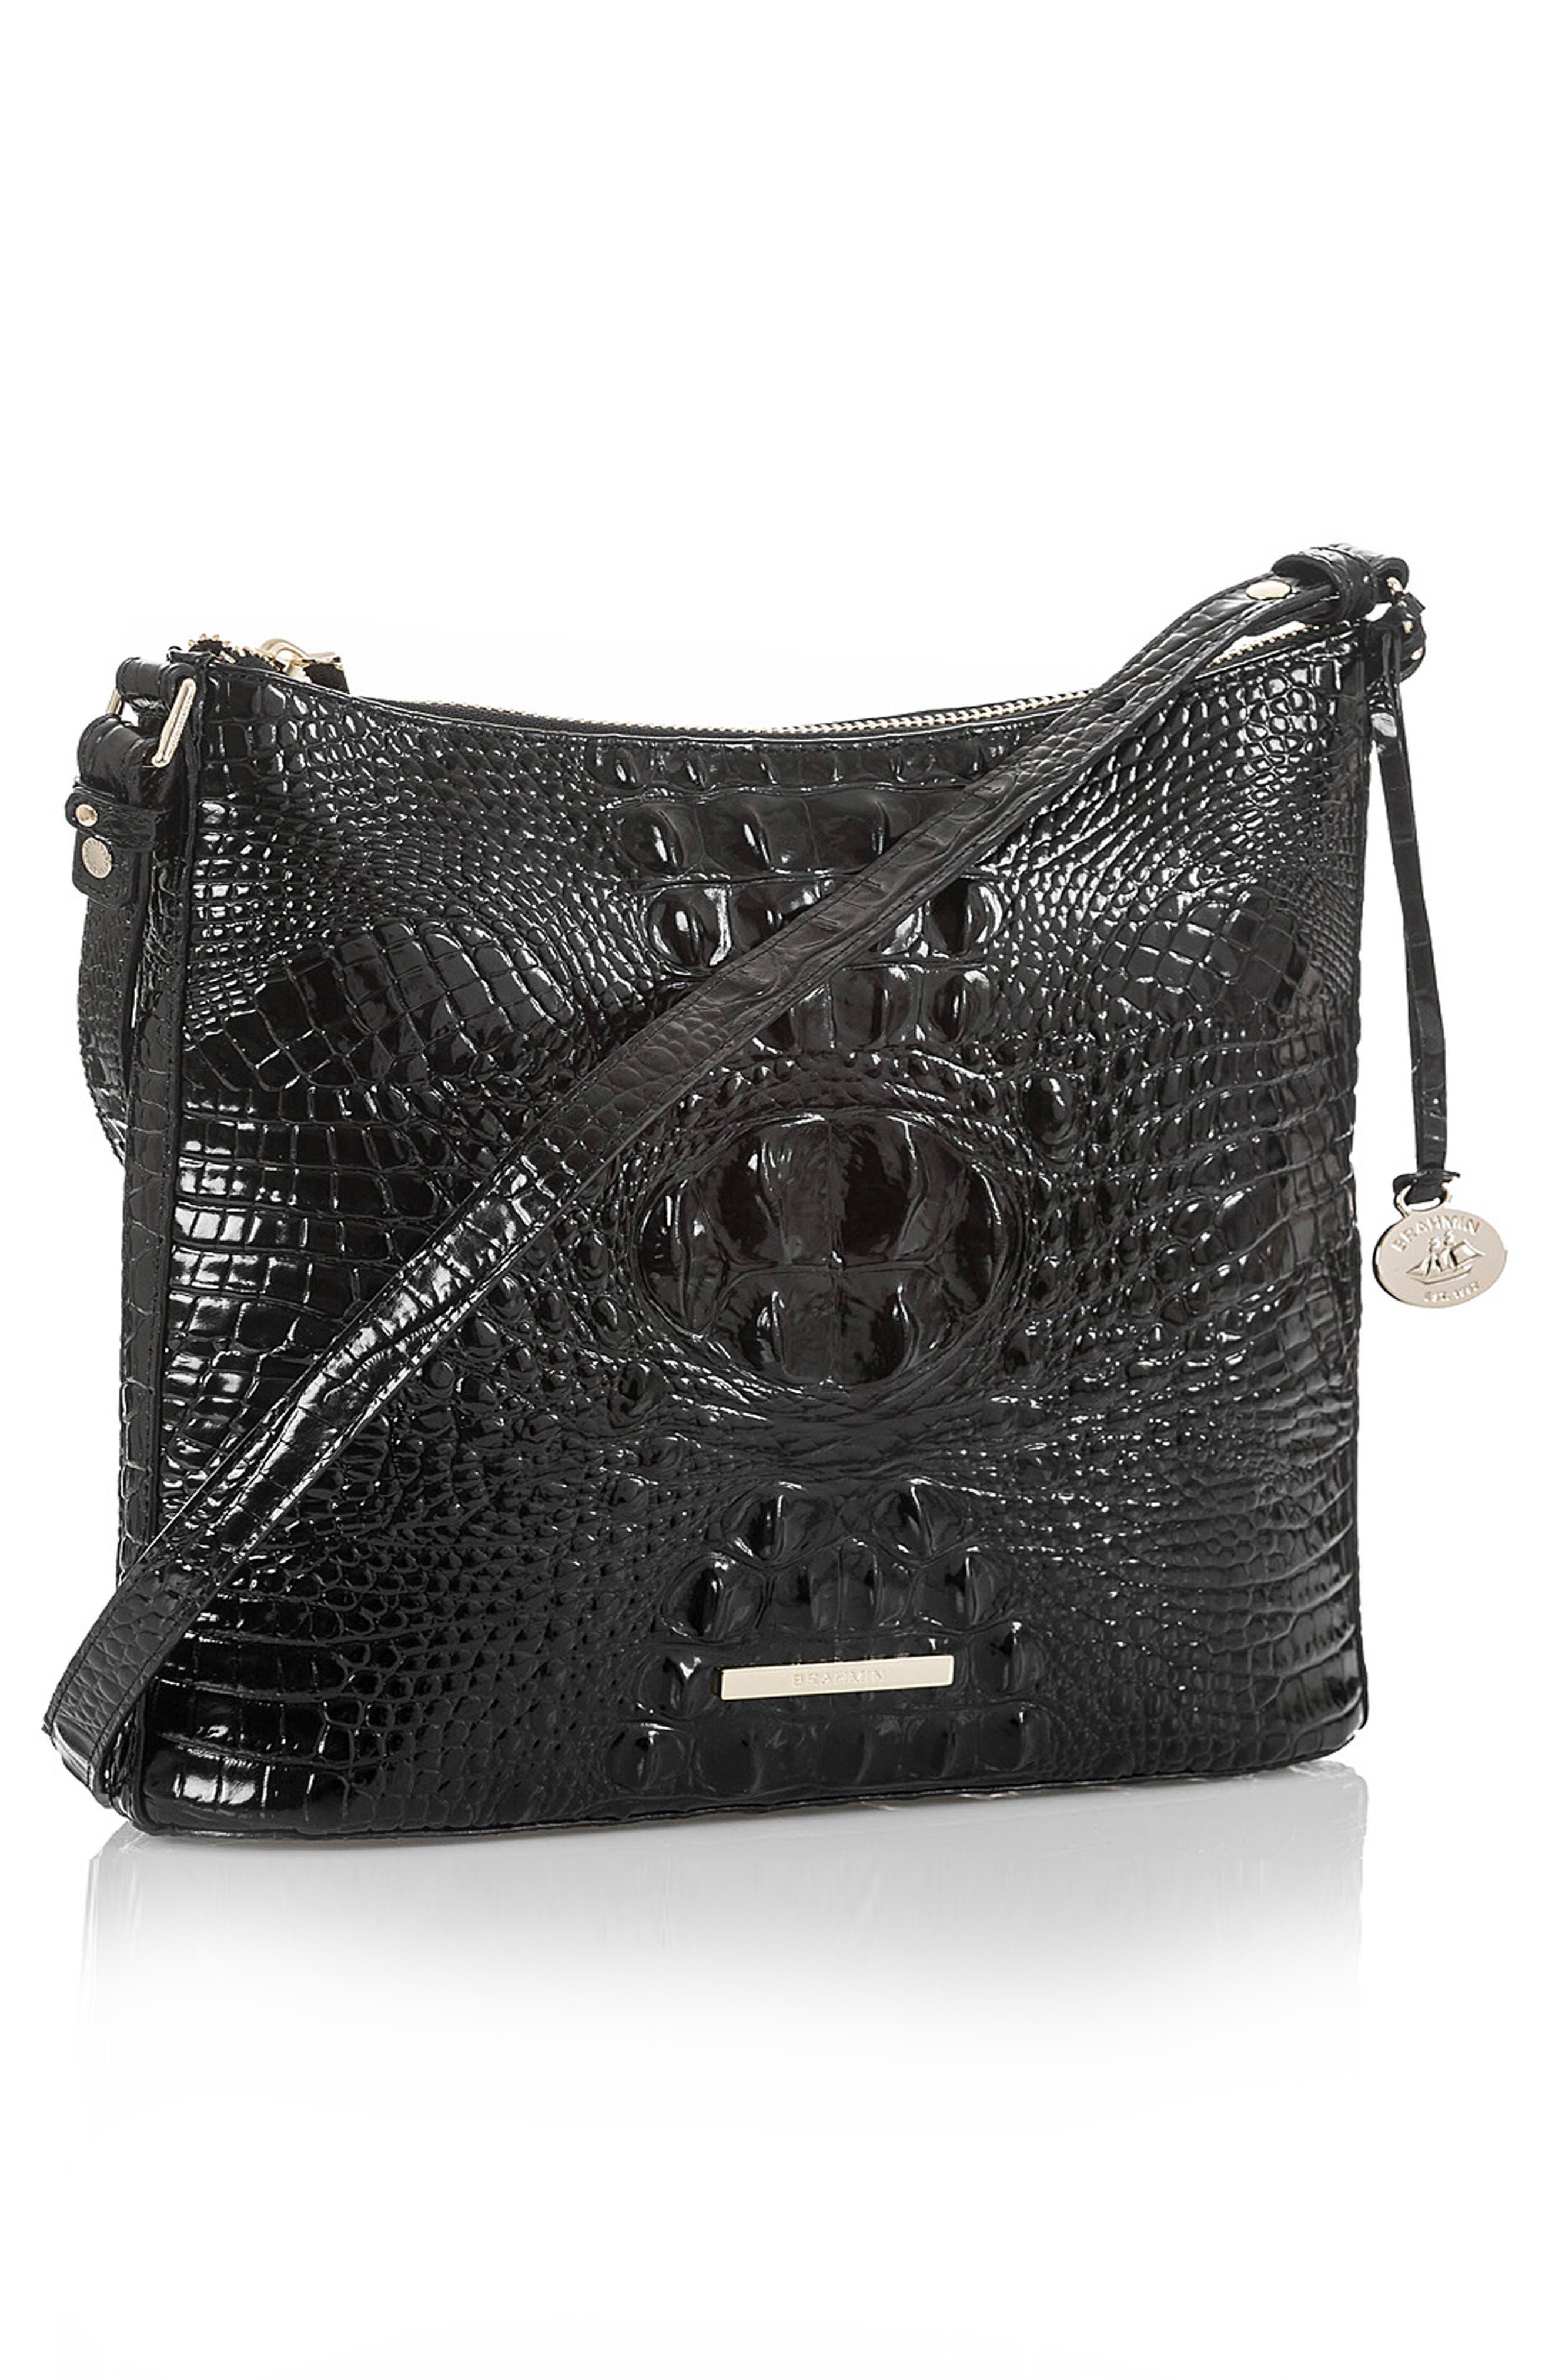 BRAHMIN,                             Katie Croc Embossed Leather Crossbody Bag,                             Alternate thumbnail 4, color,                             BLACK MEMBOURNE